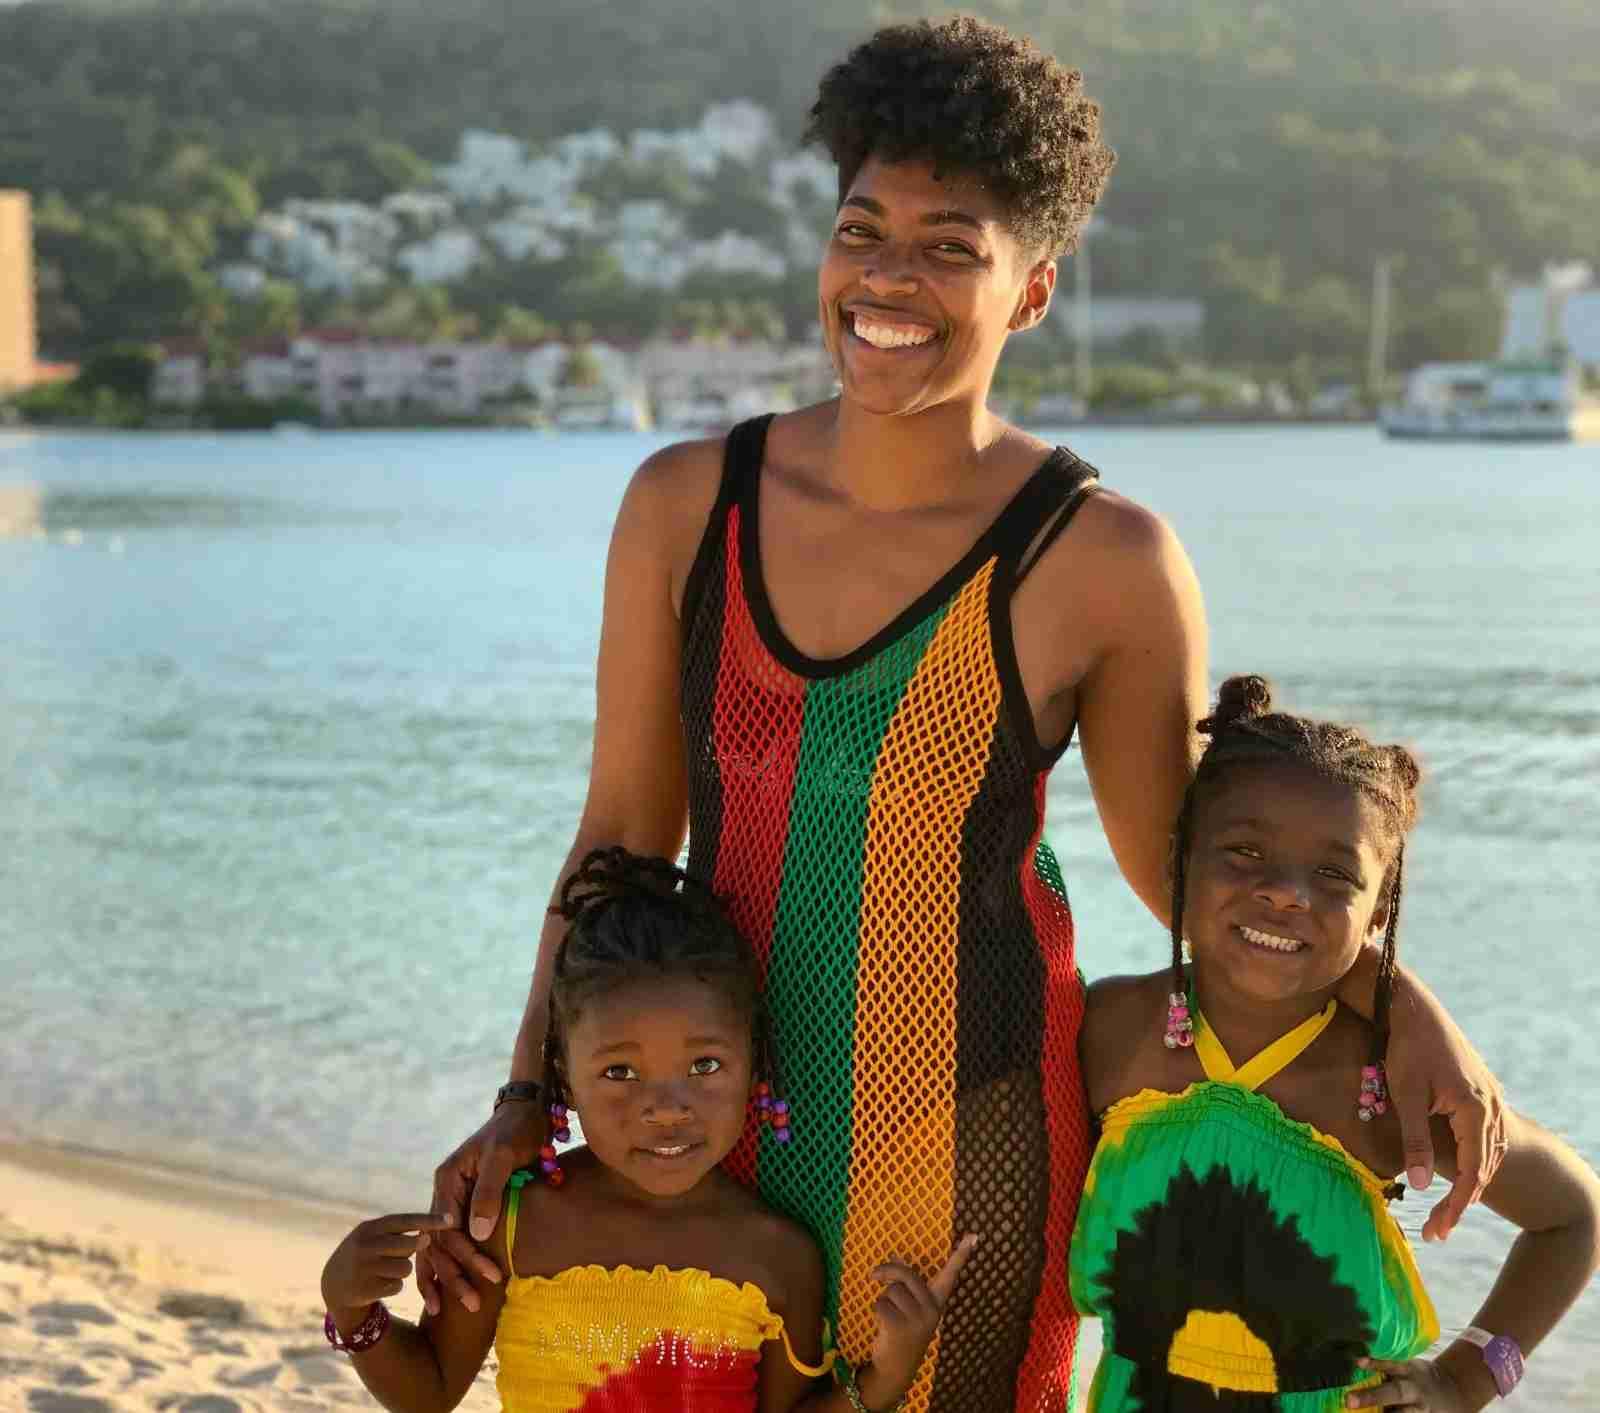 Jamaica - Photo by Monet Hambrick